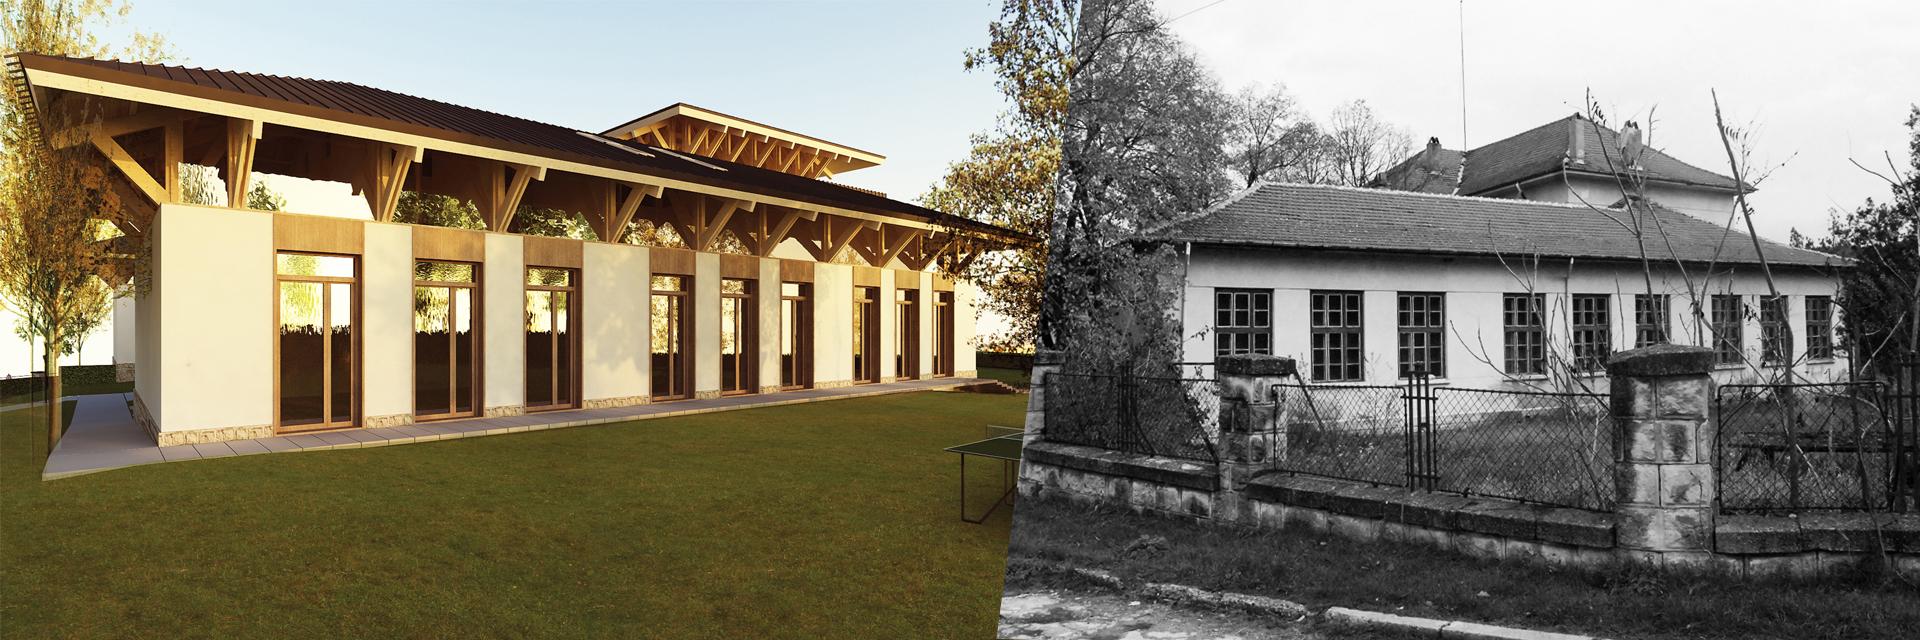 pisanets building, academy architecture, architecture reconstruction